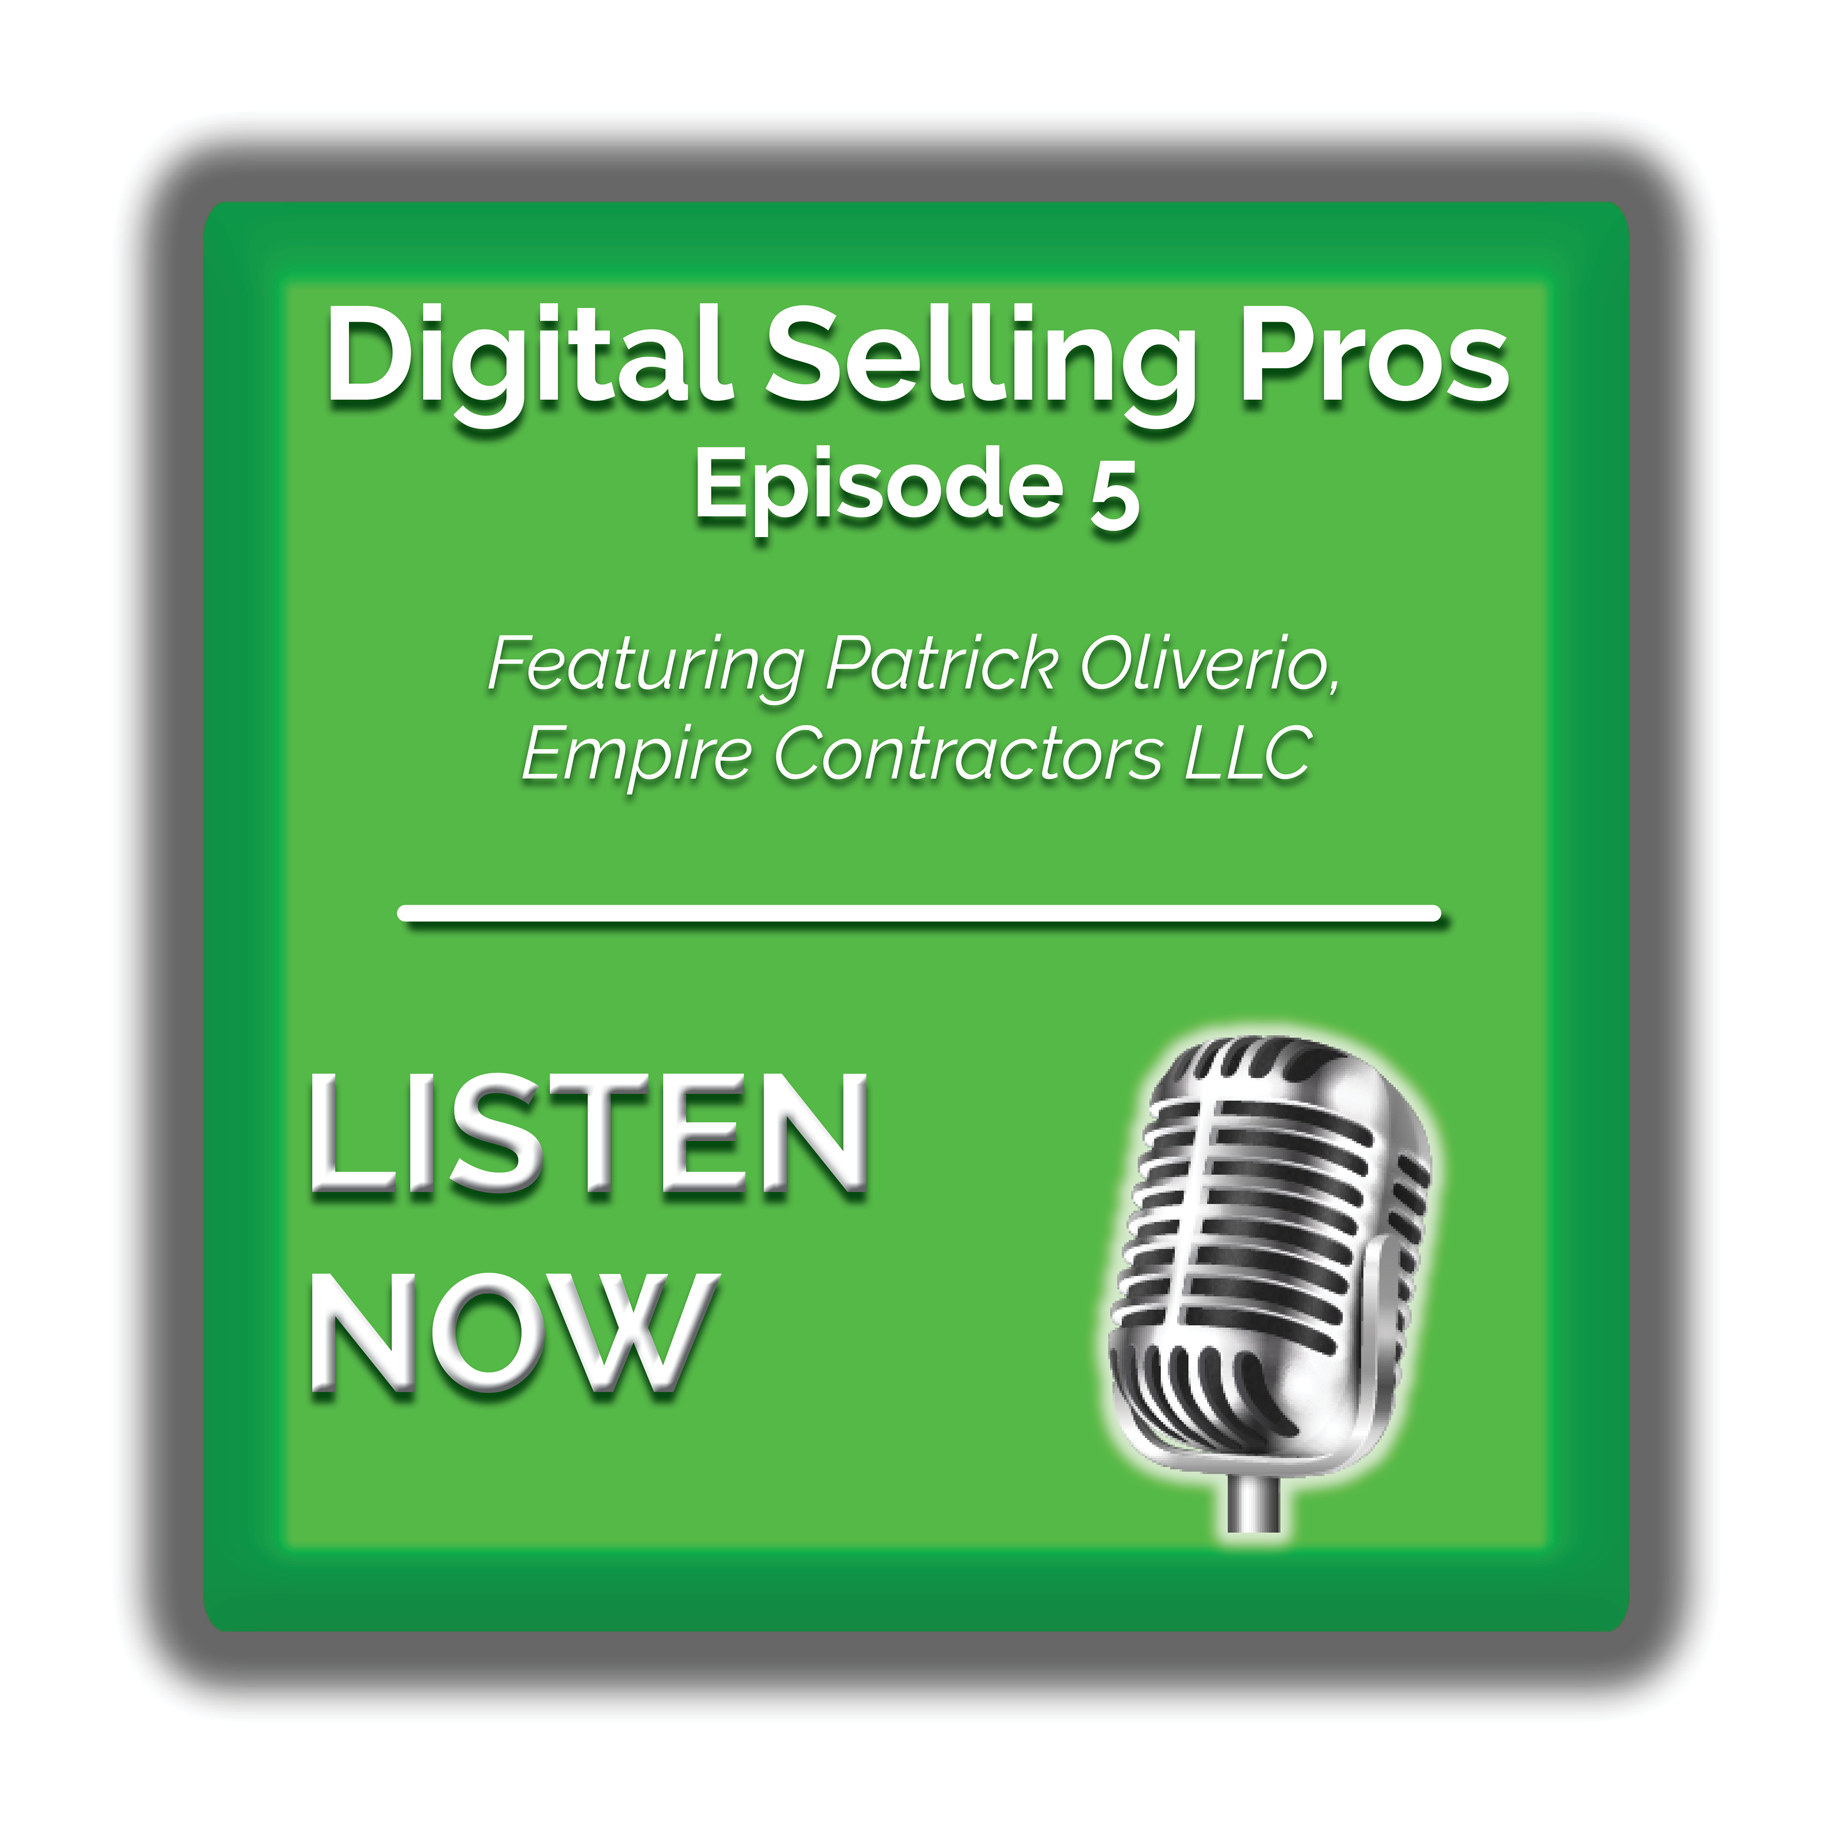 Listen-Now-Patrick Oliverio-Button